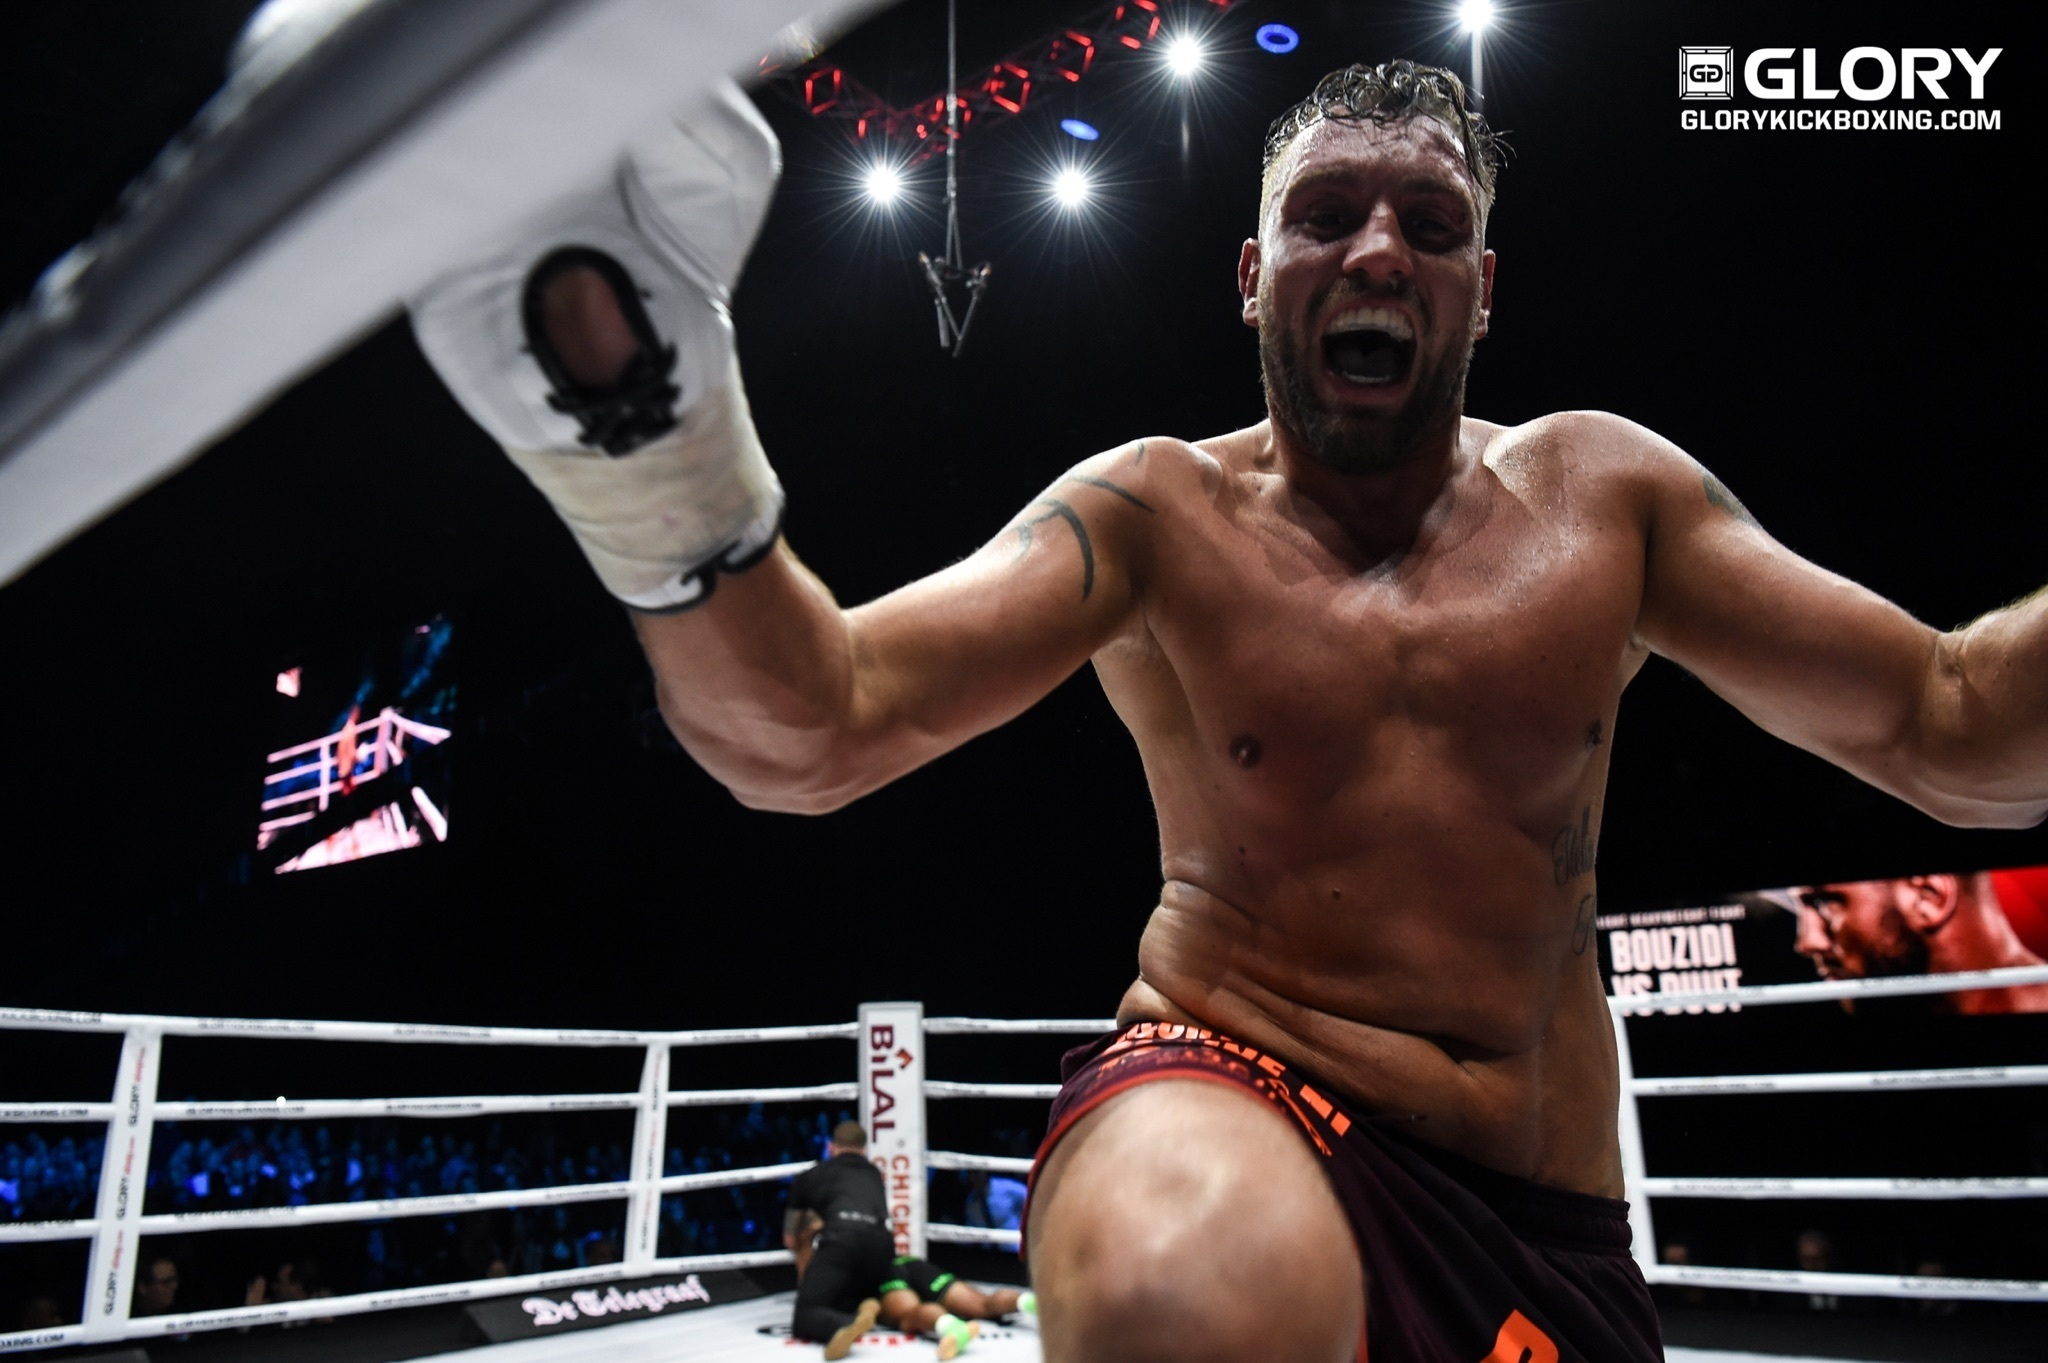 Duut gets revenge, crushes Bouzidi with highlight-reel knockout